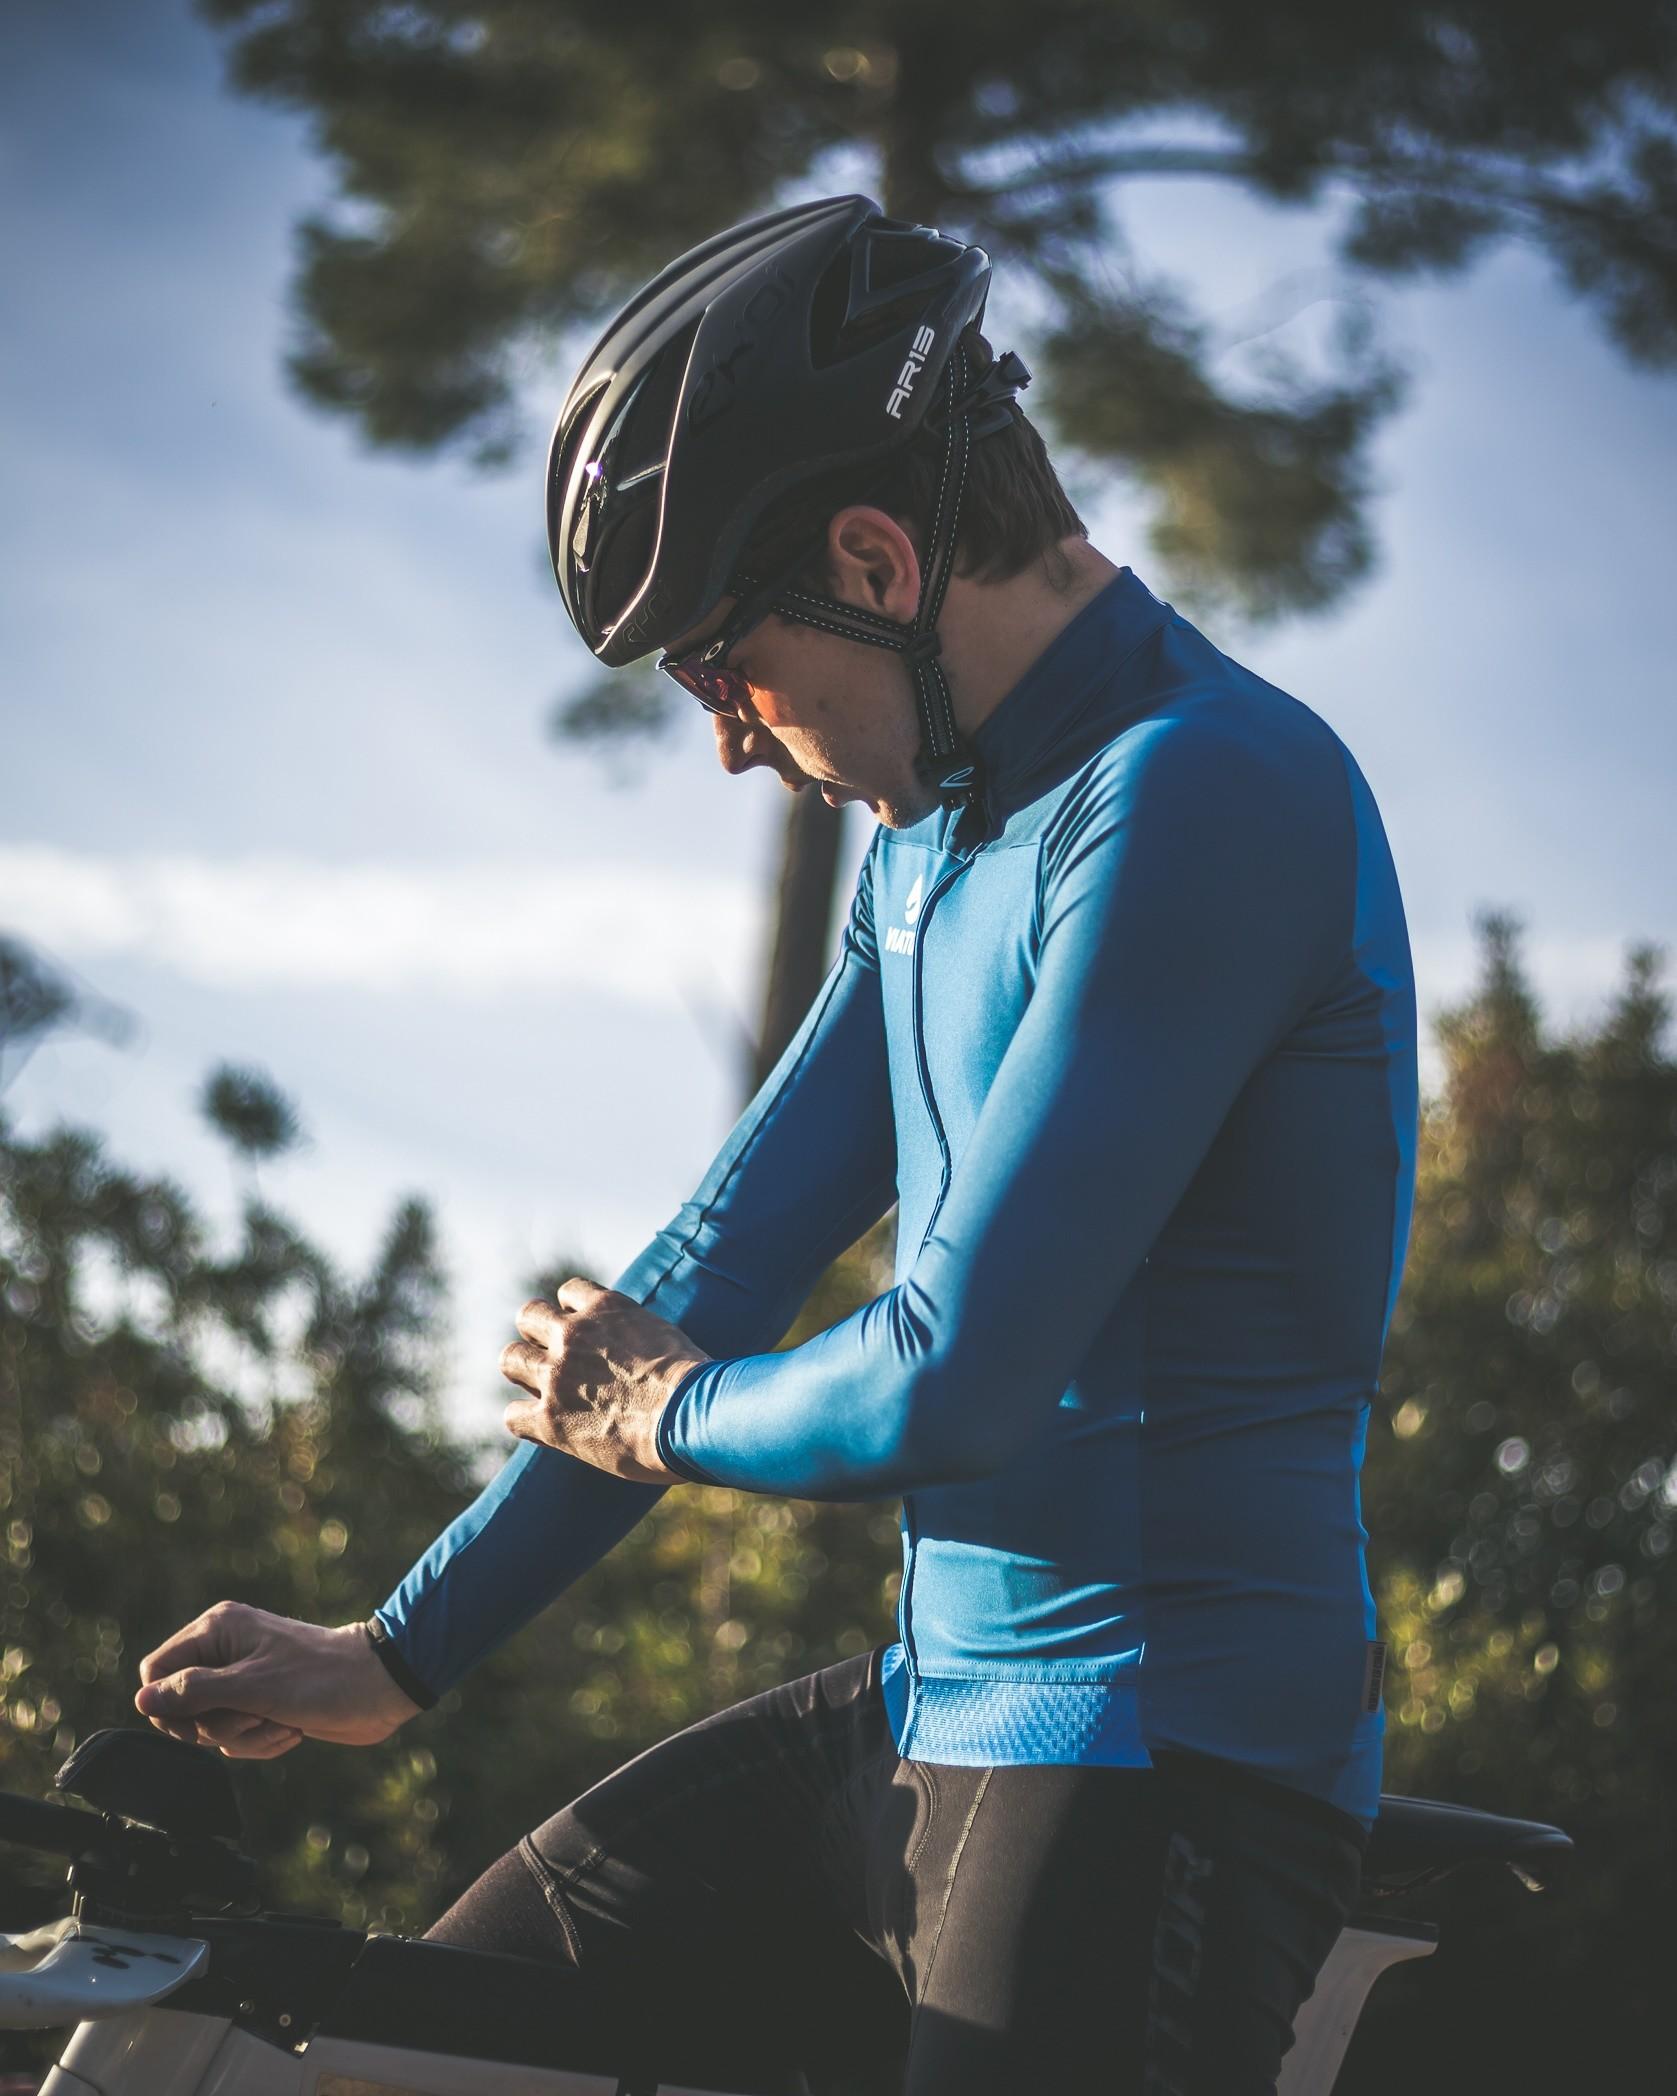 Le nouveau maillot cycliste Viator: Madeleine